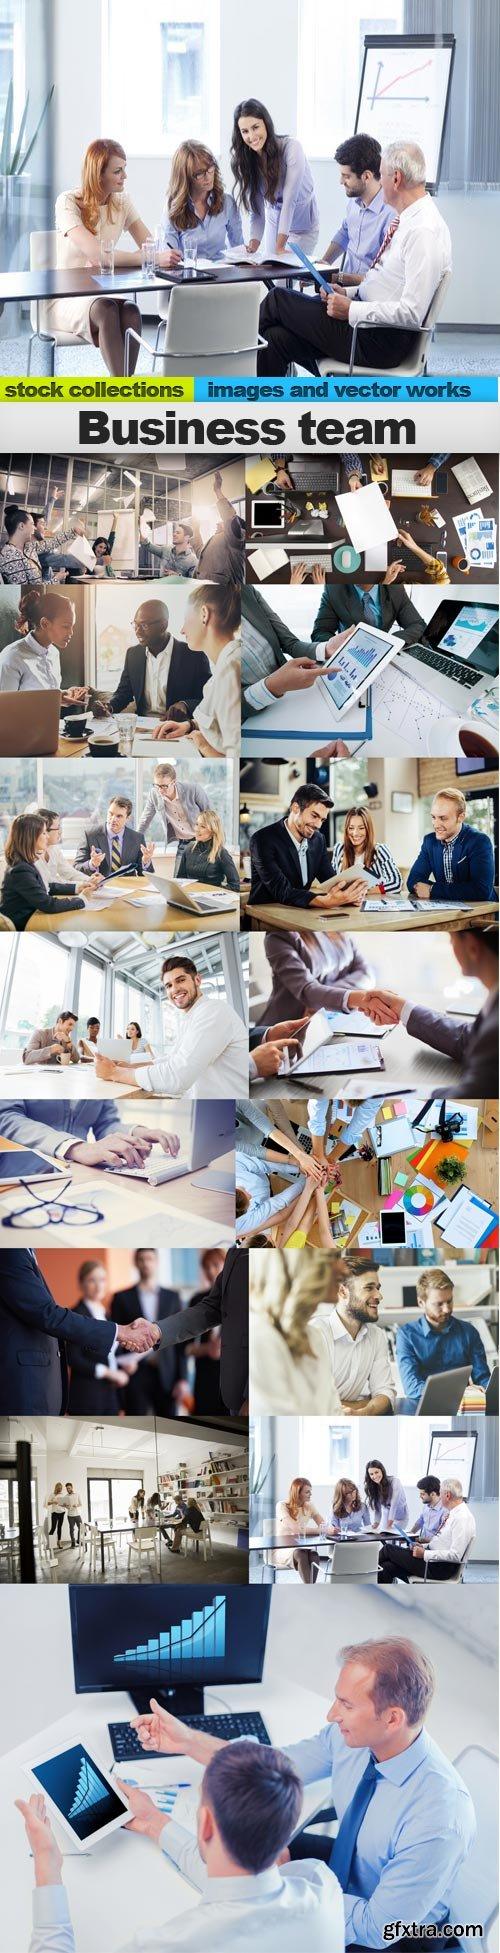 Business team, 15 x UHQ JPEG